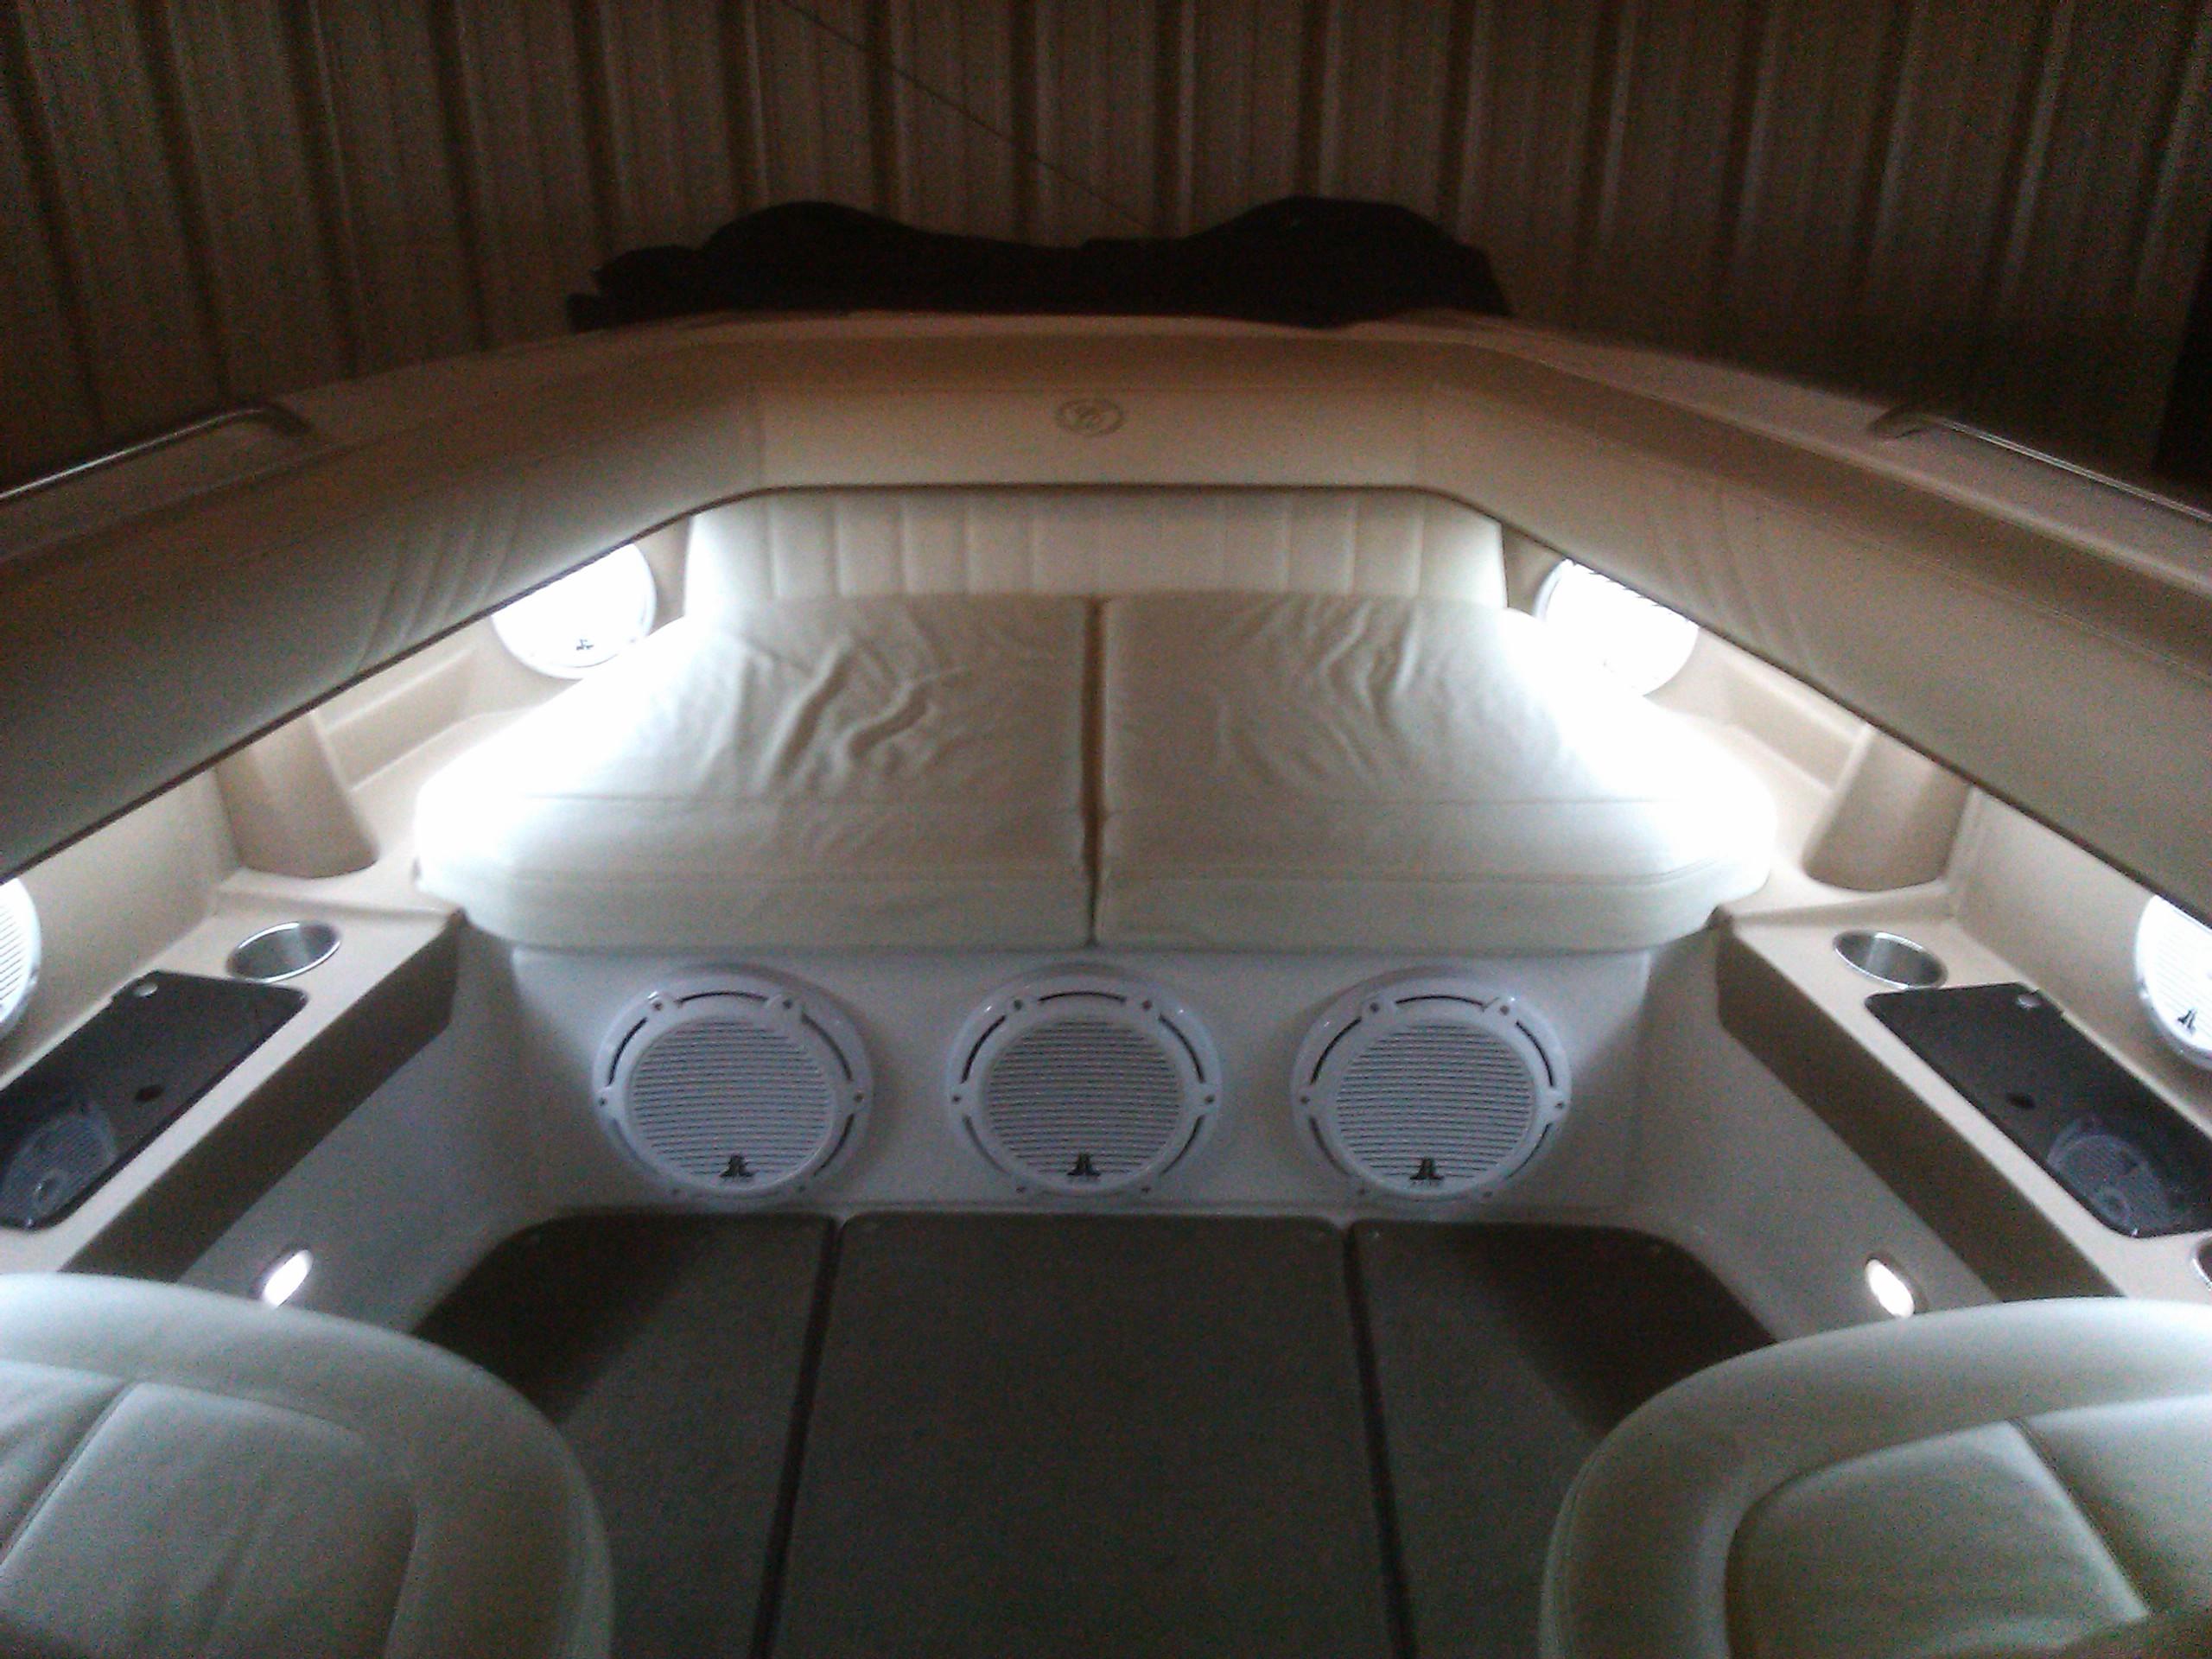 2007 Cobalt 302 JL Audio Subwoofers Custom Mounted Speakers Volume Knobs